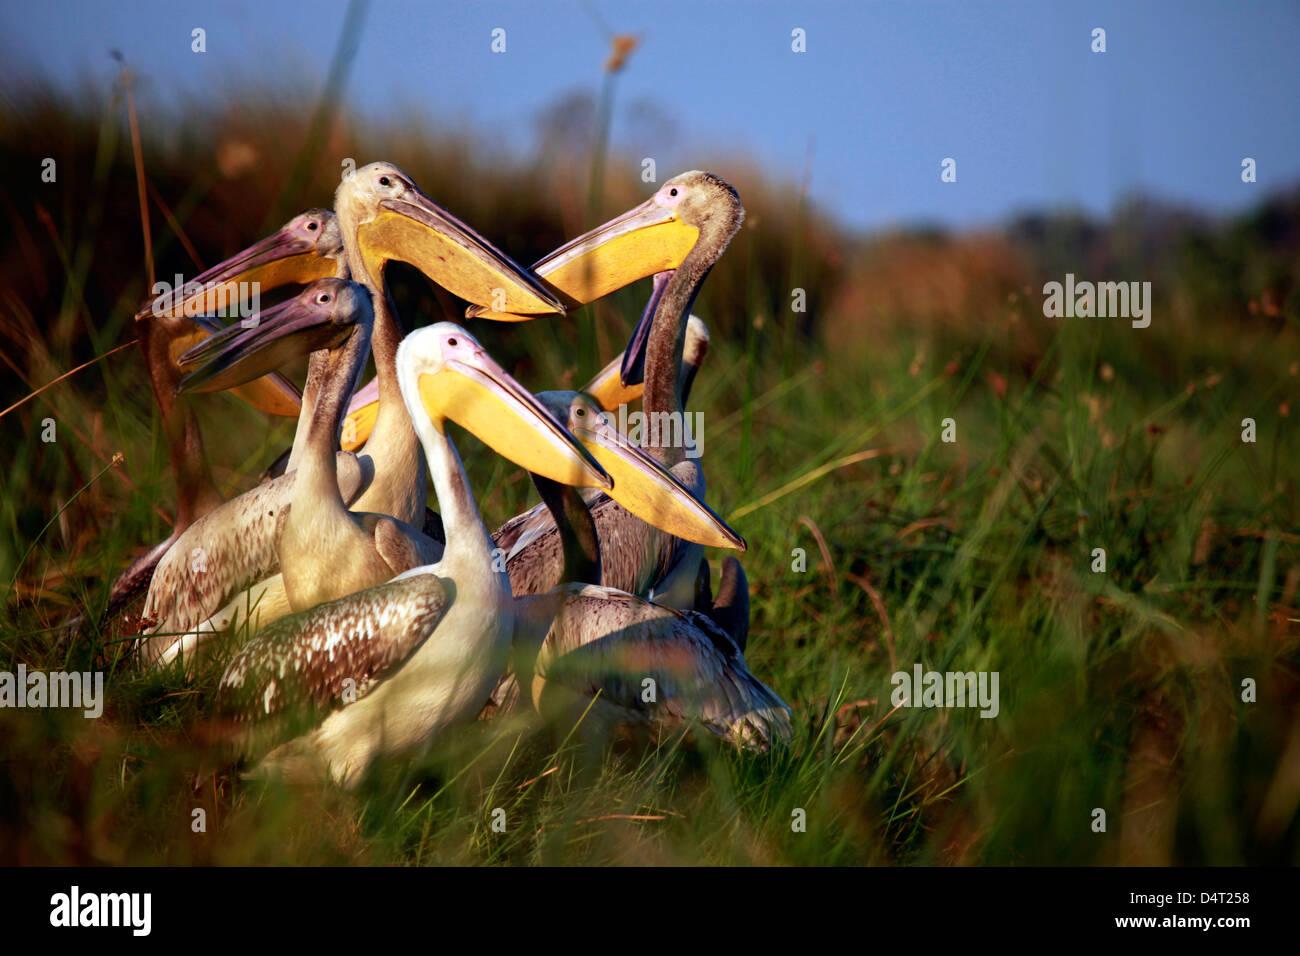 Botswana, Okavango Delta. Pink-backed Pelicans. - Stock Image